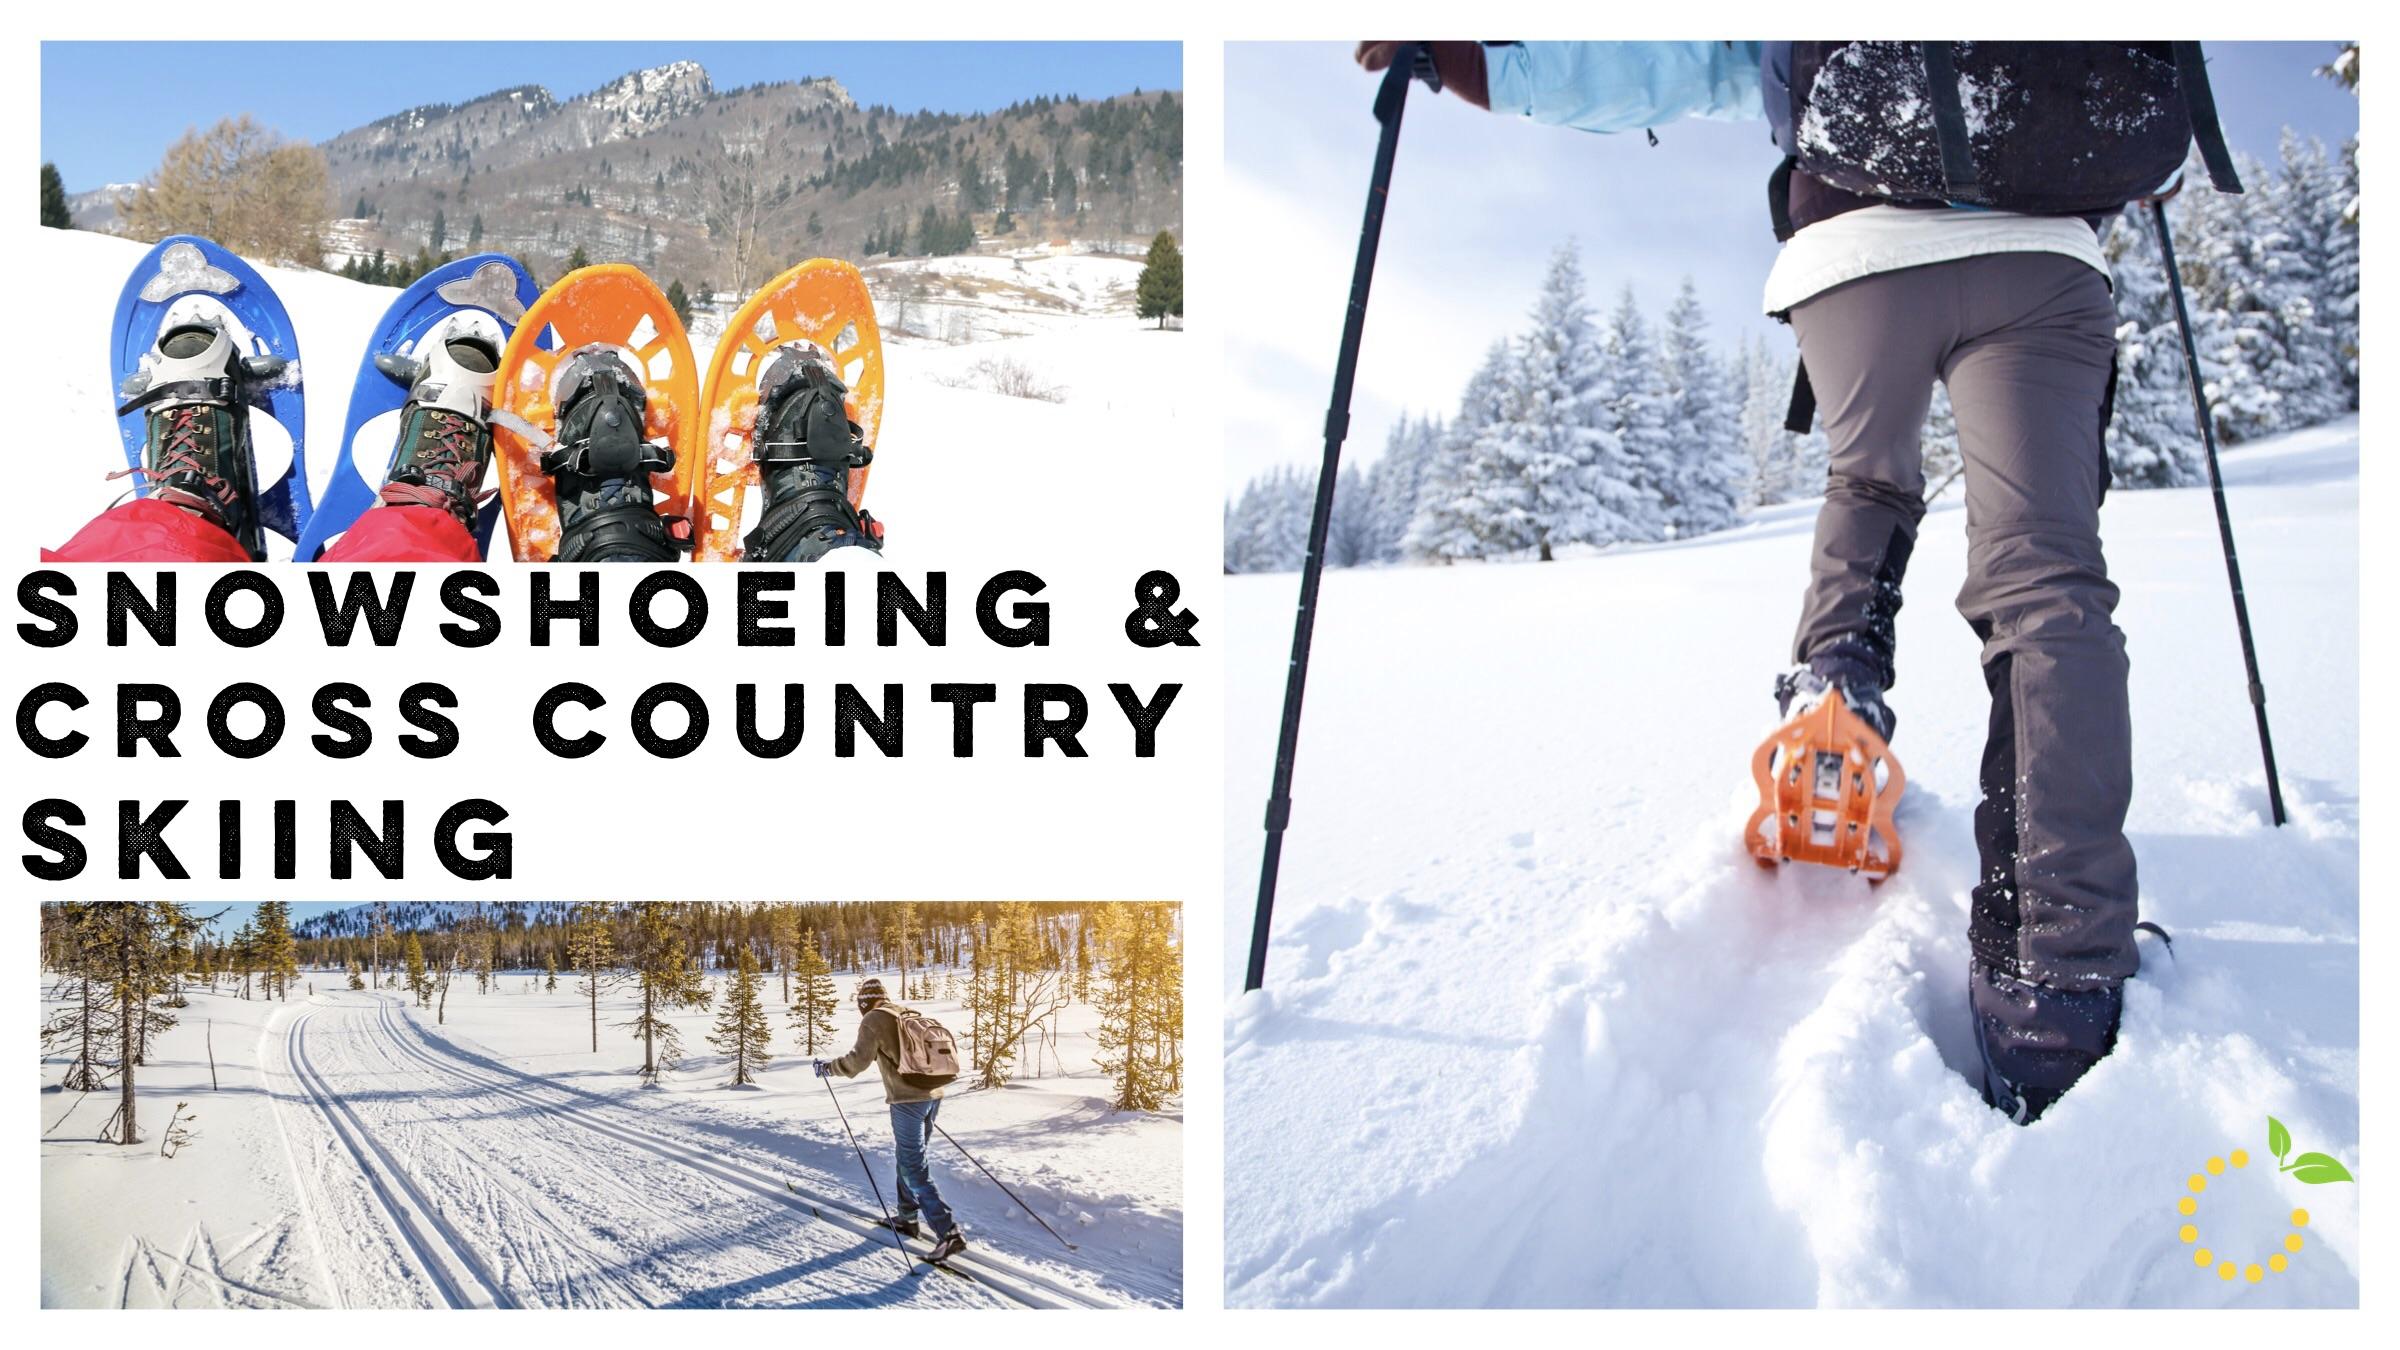 Snowshoeing sweetlemonmade.com